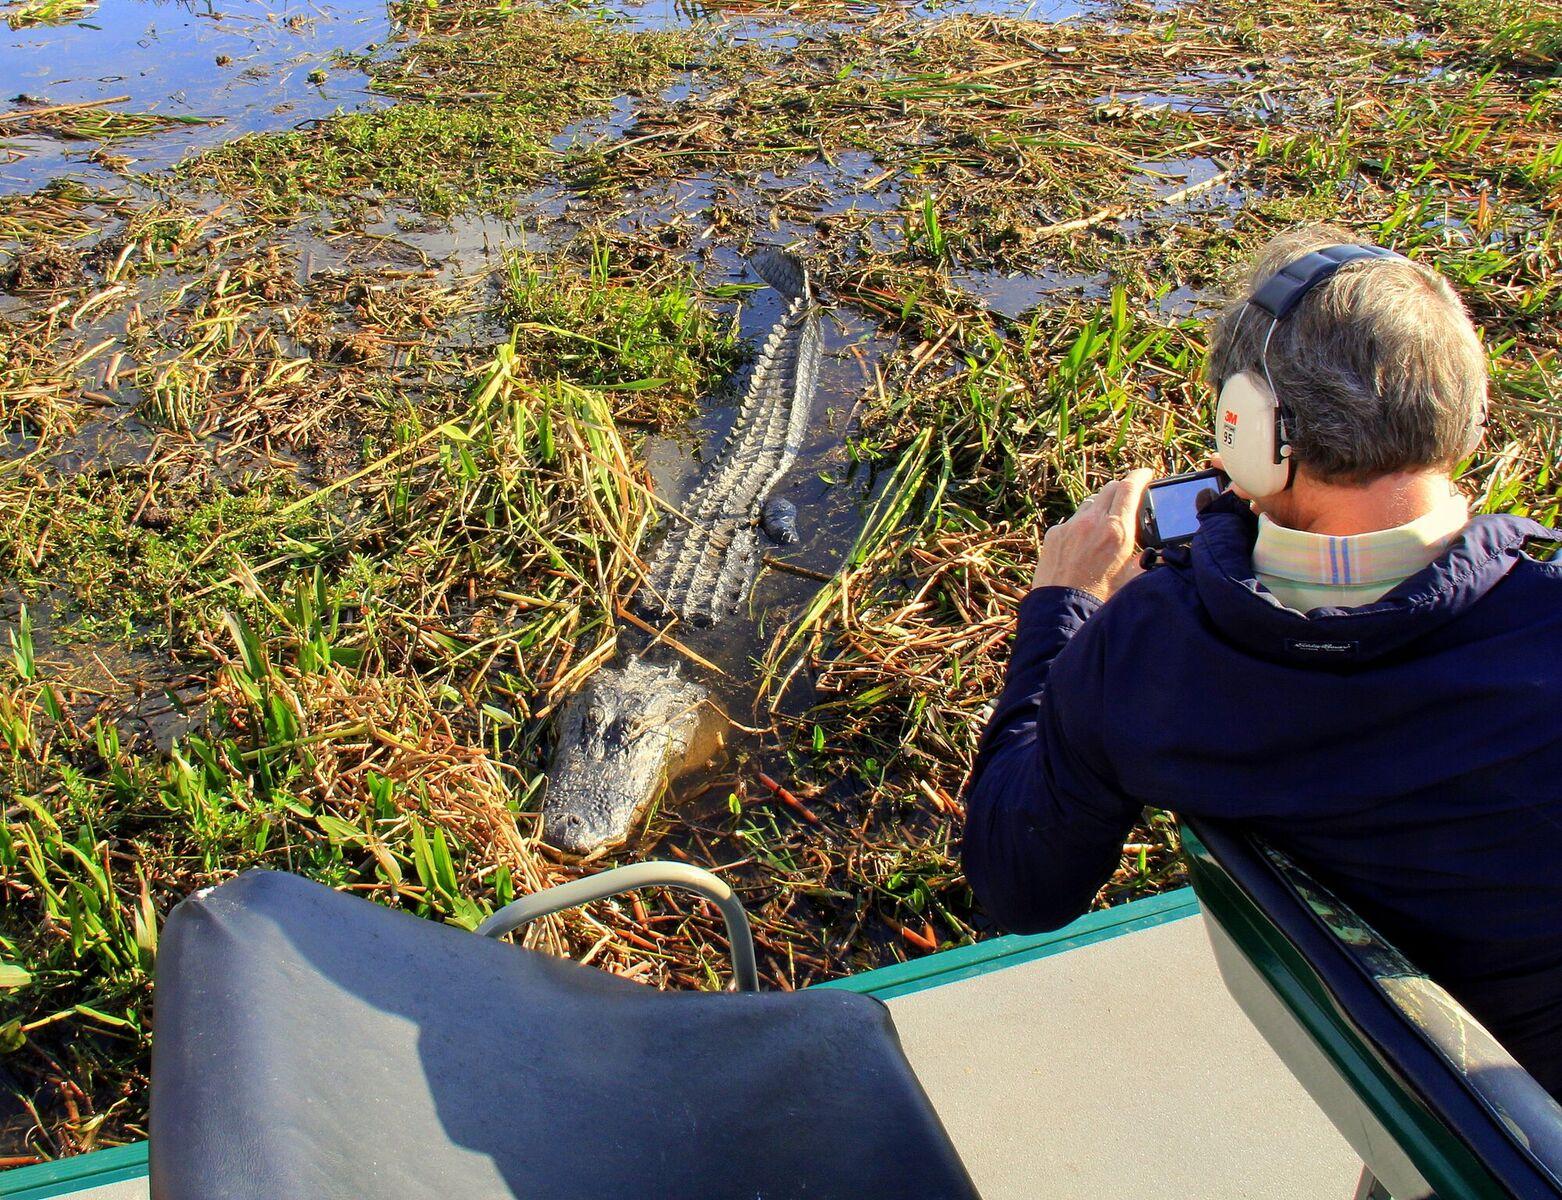 airboat_rides_in_Florida.jpg